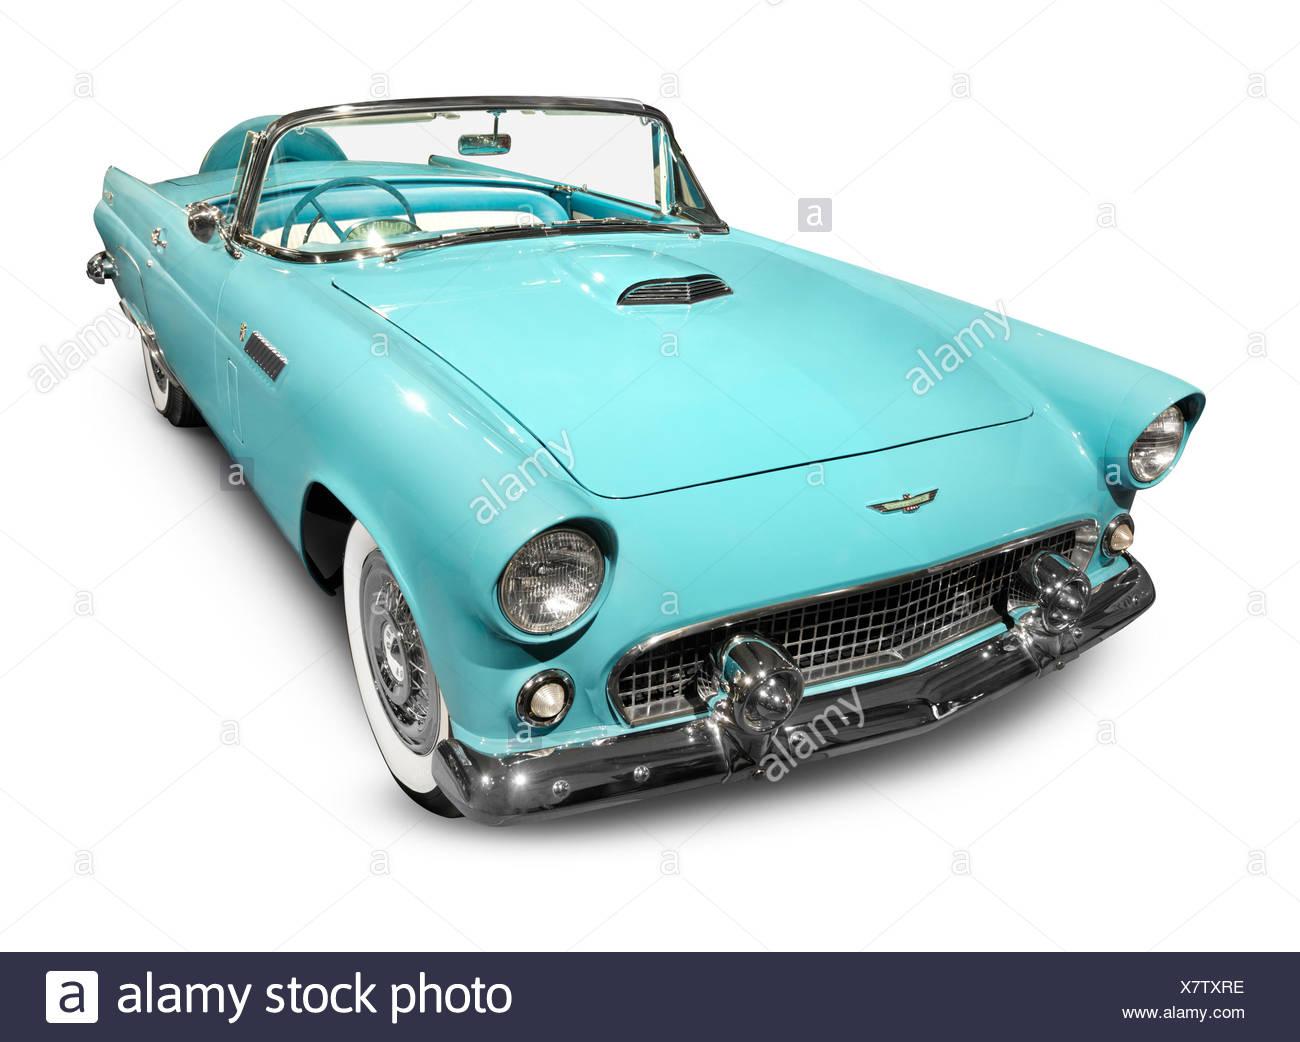 Sky-blue 1956 Ford Thunderbird classic retro car isolated on white background - Stock Image